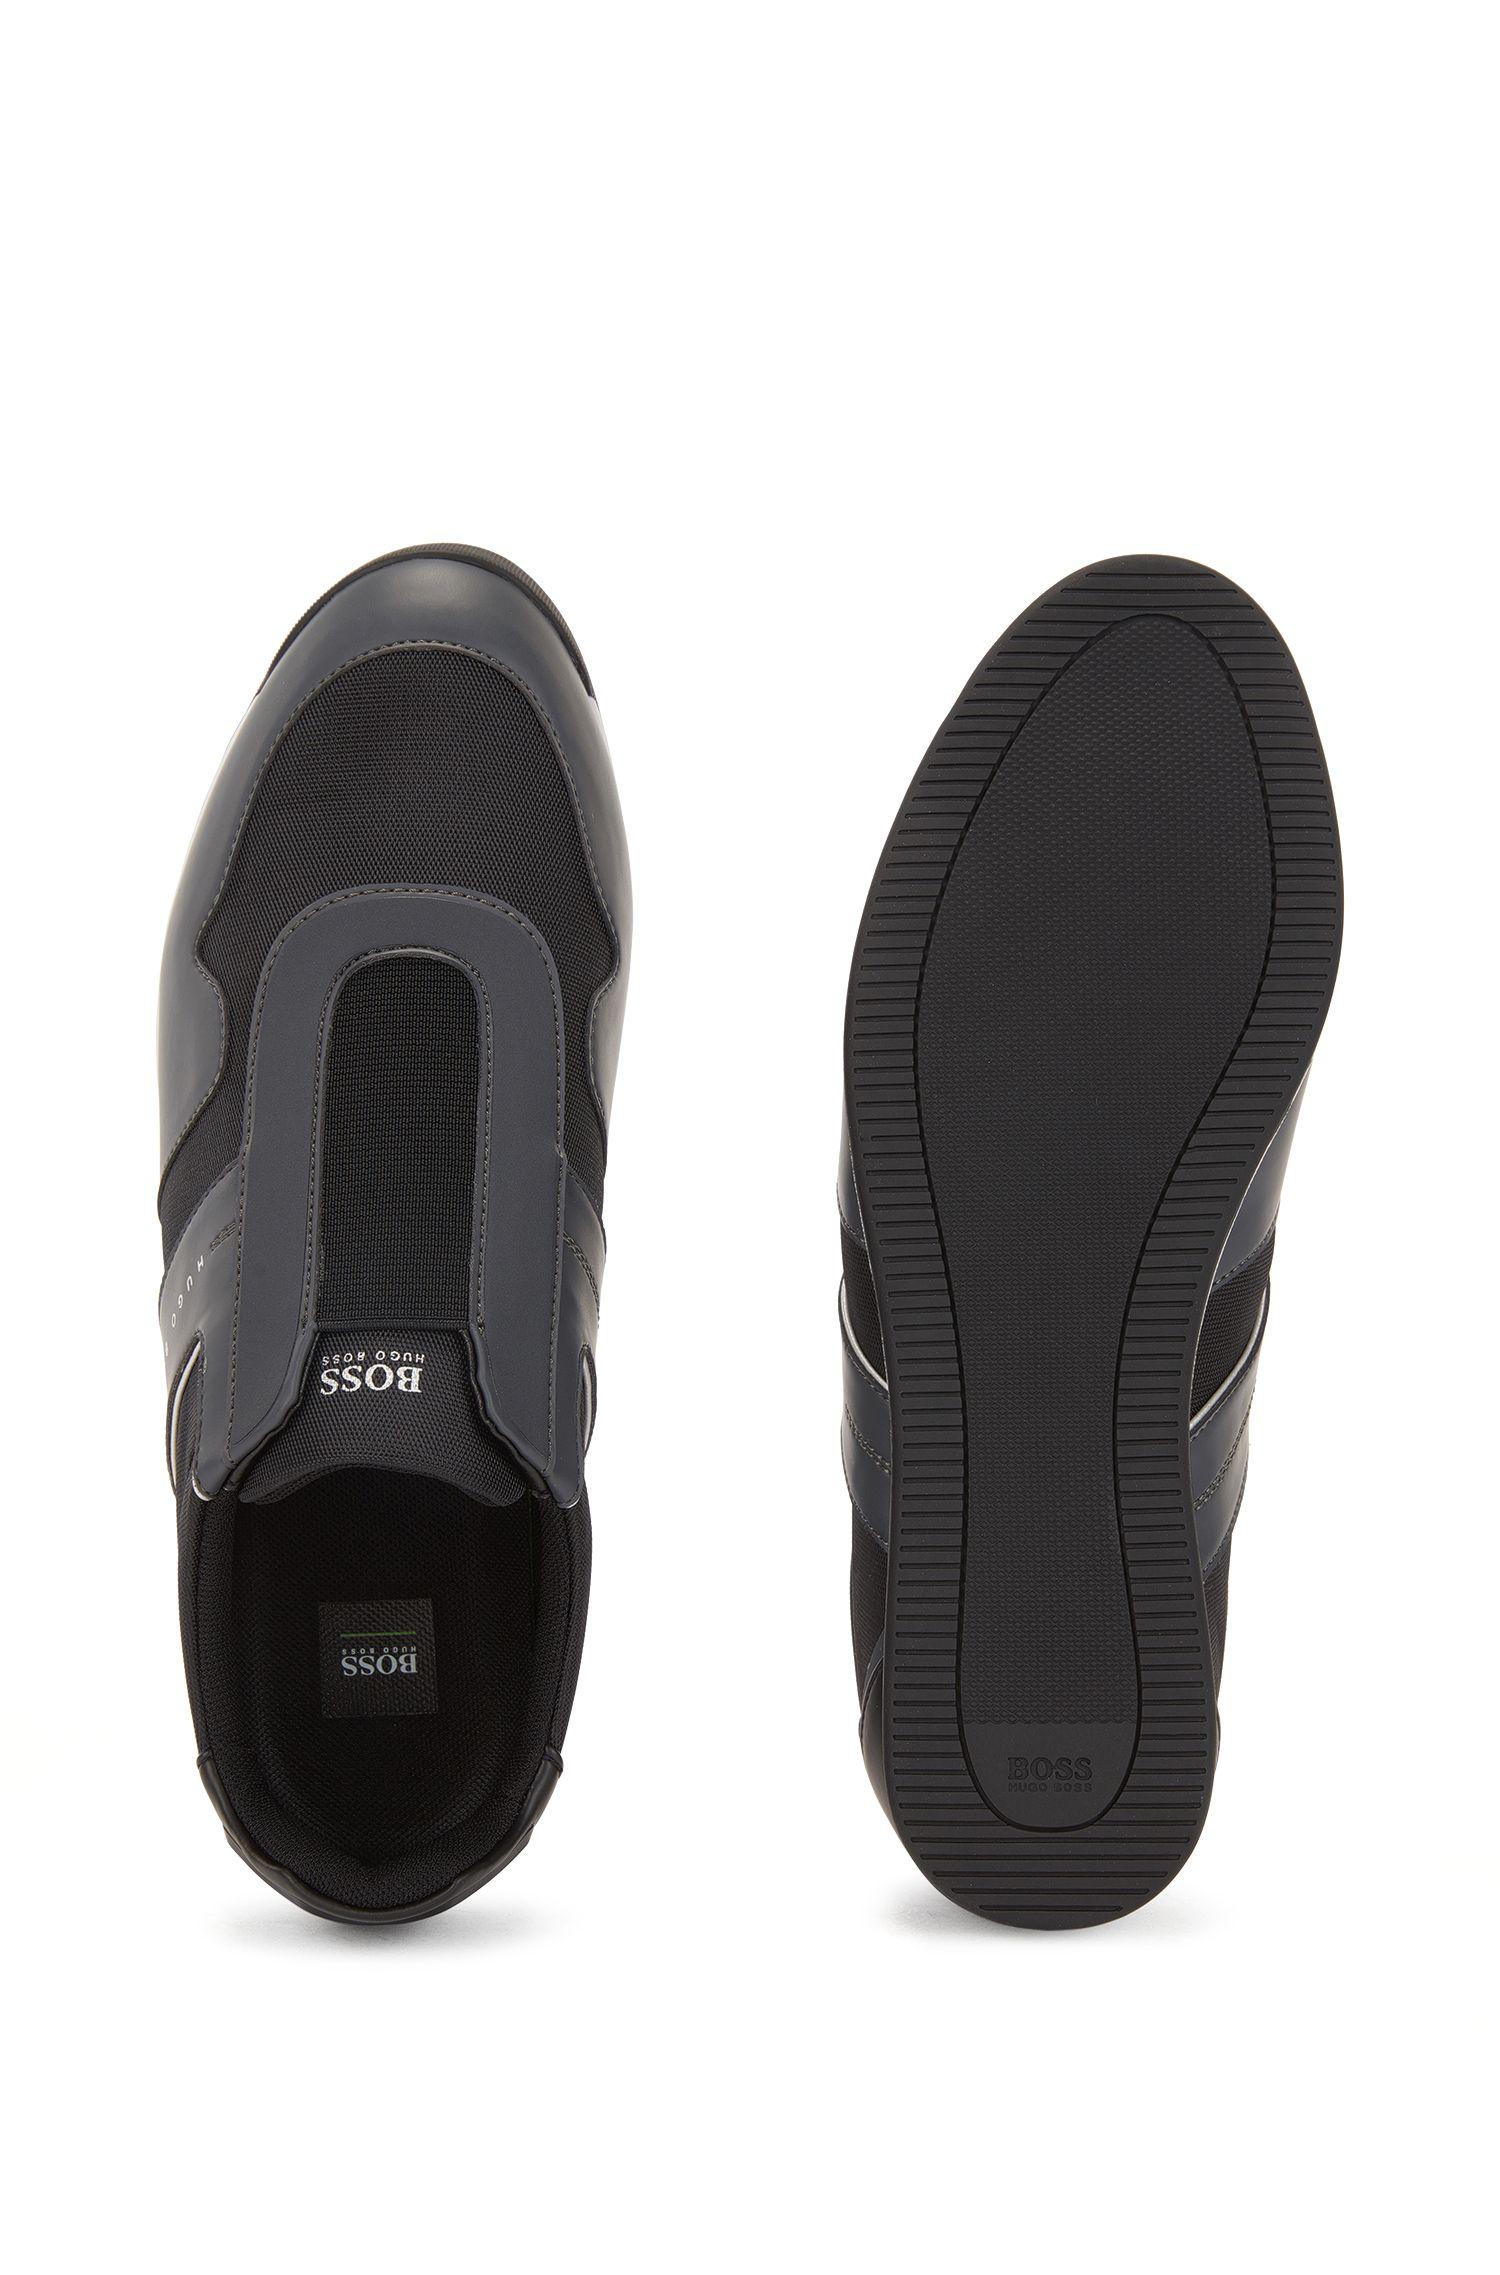 Instapsneakers met meshdetail